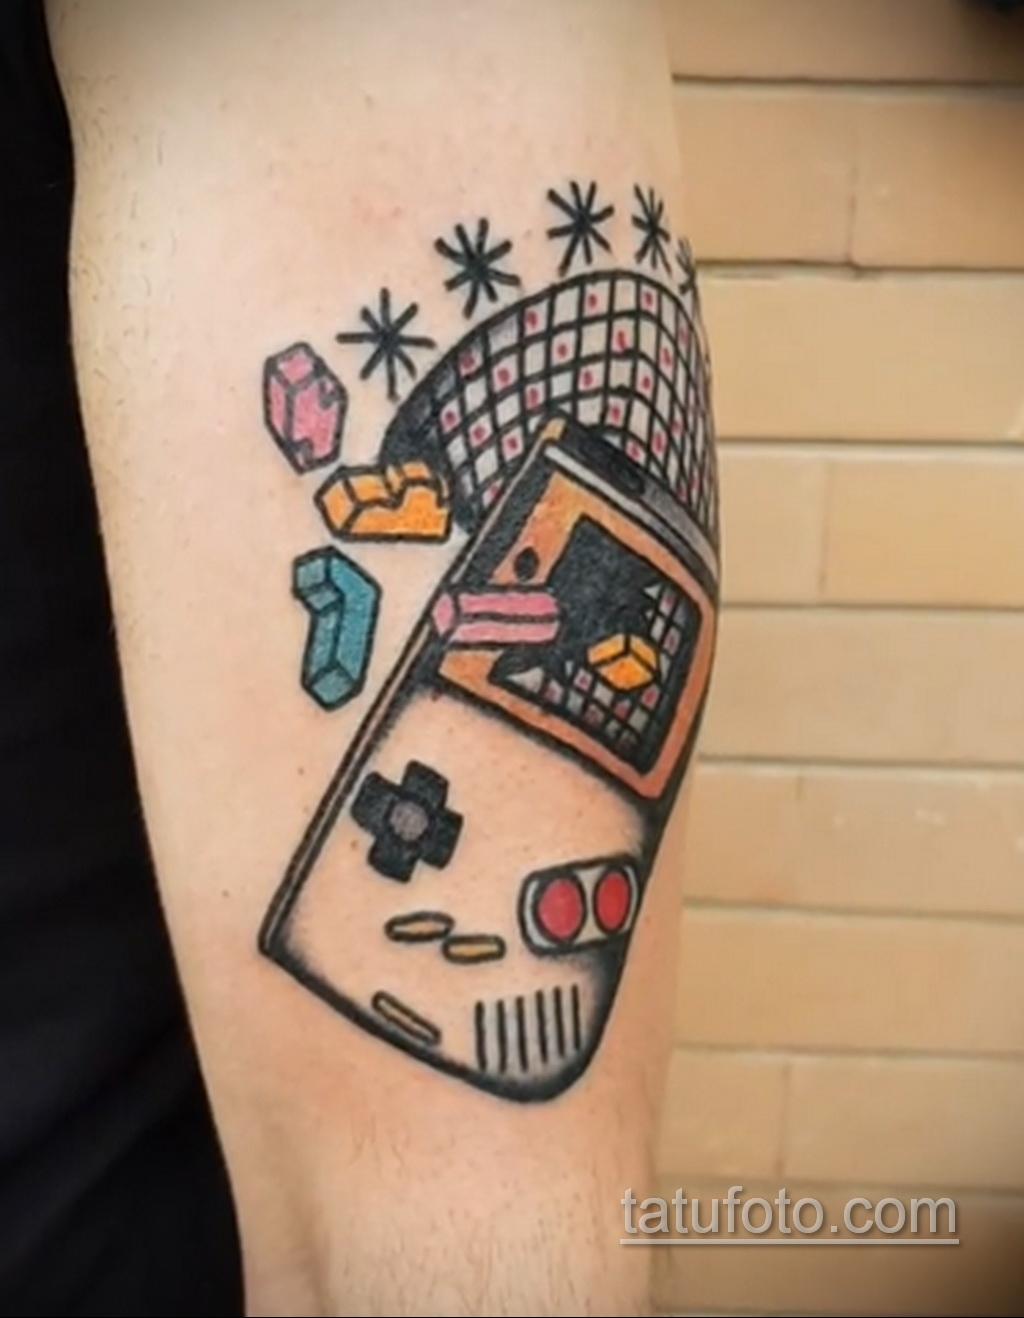 Фото татуировки с тетрисом 18.07.2020 №045 -tetris tattoo- tatufoto.com